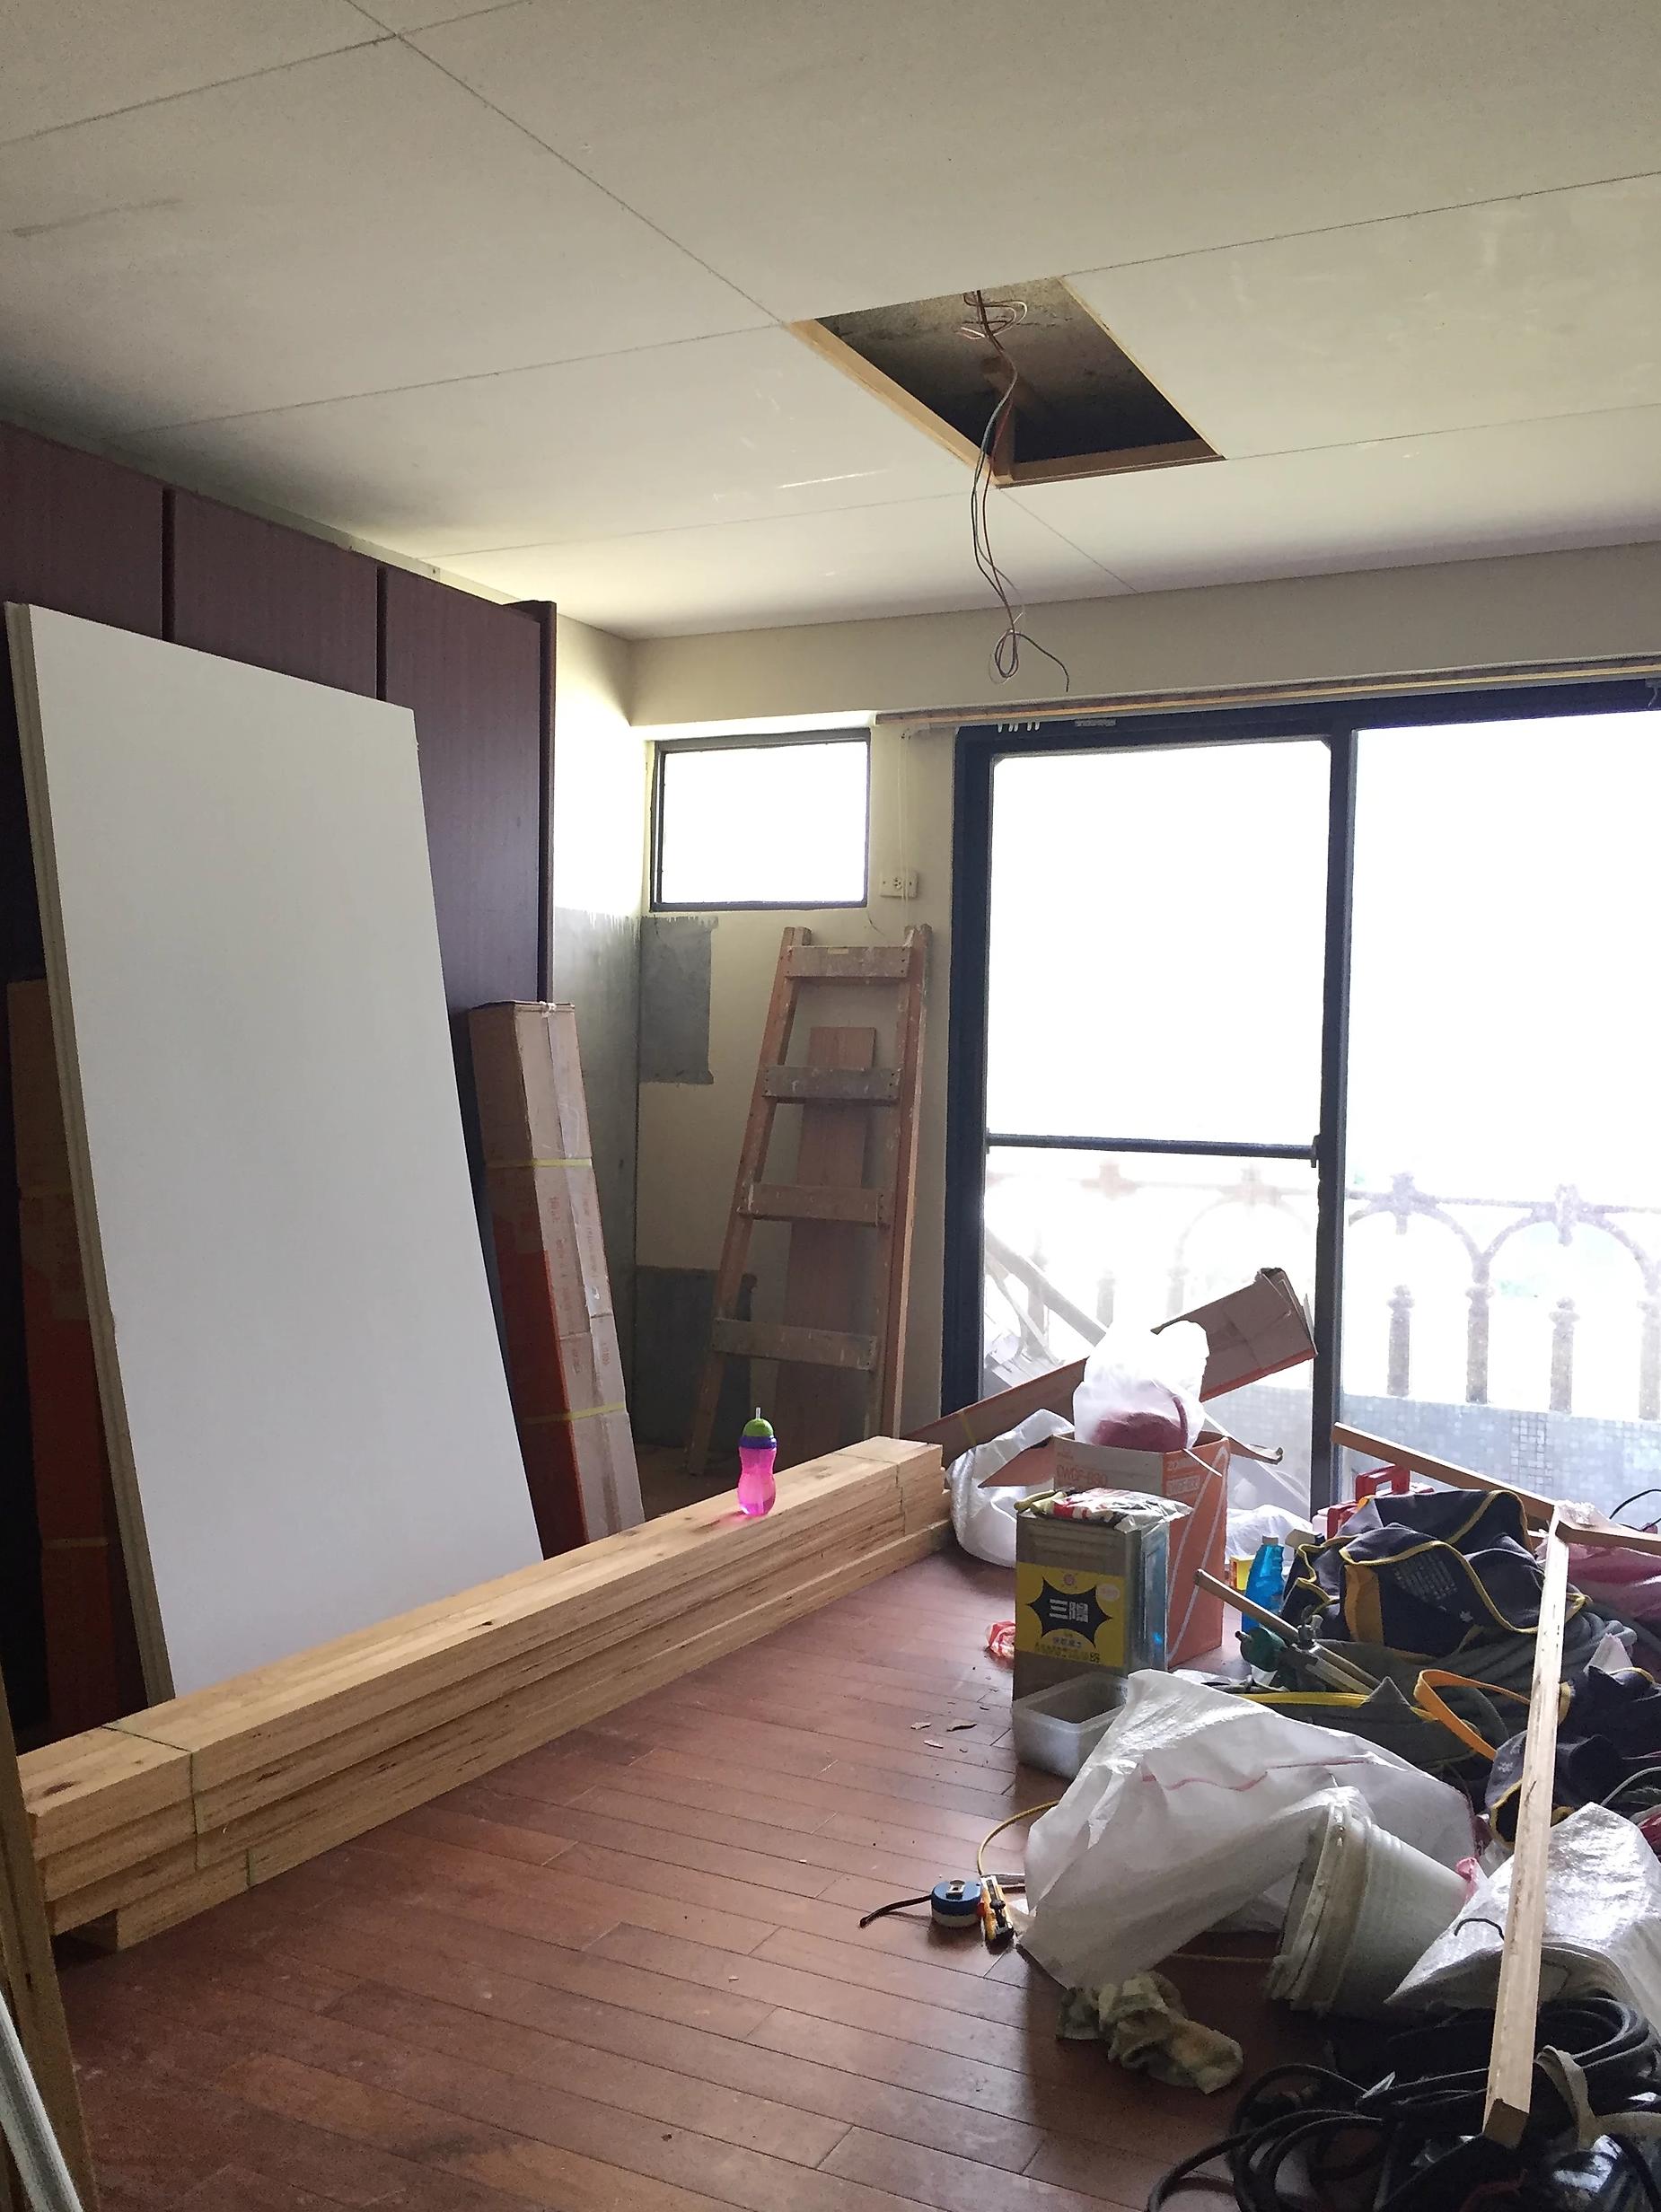 德築-DEZU-project-礁溪套房裝修-architecture-interior-renovation-3